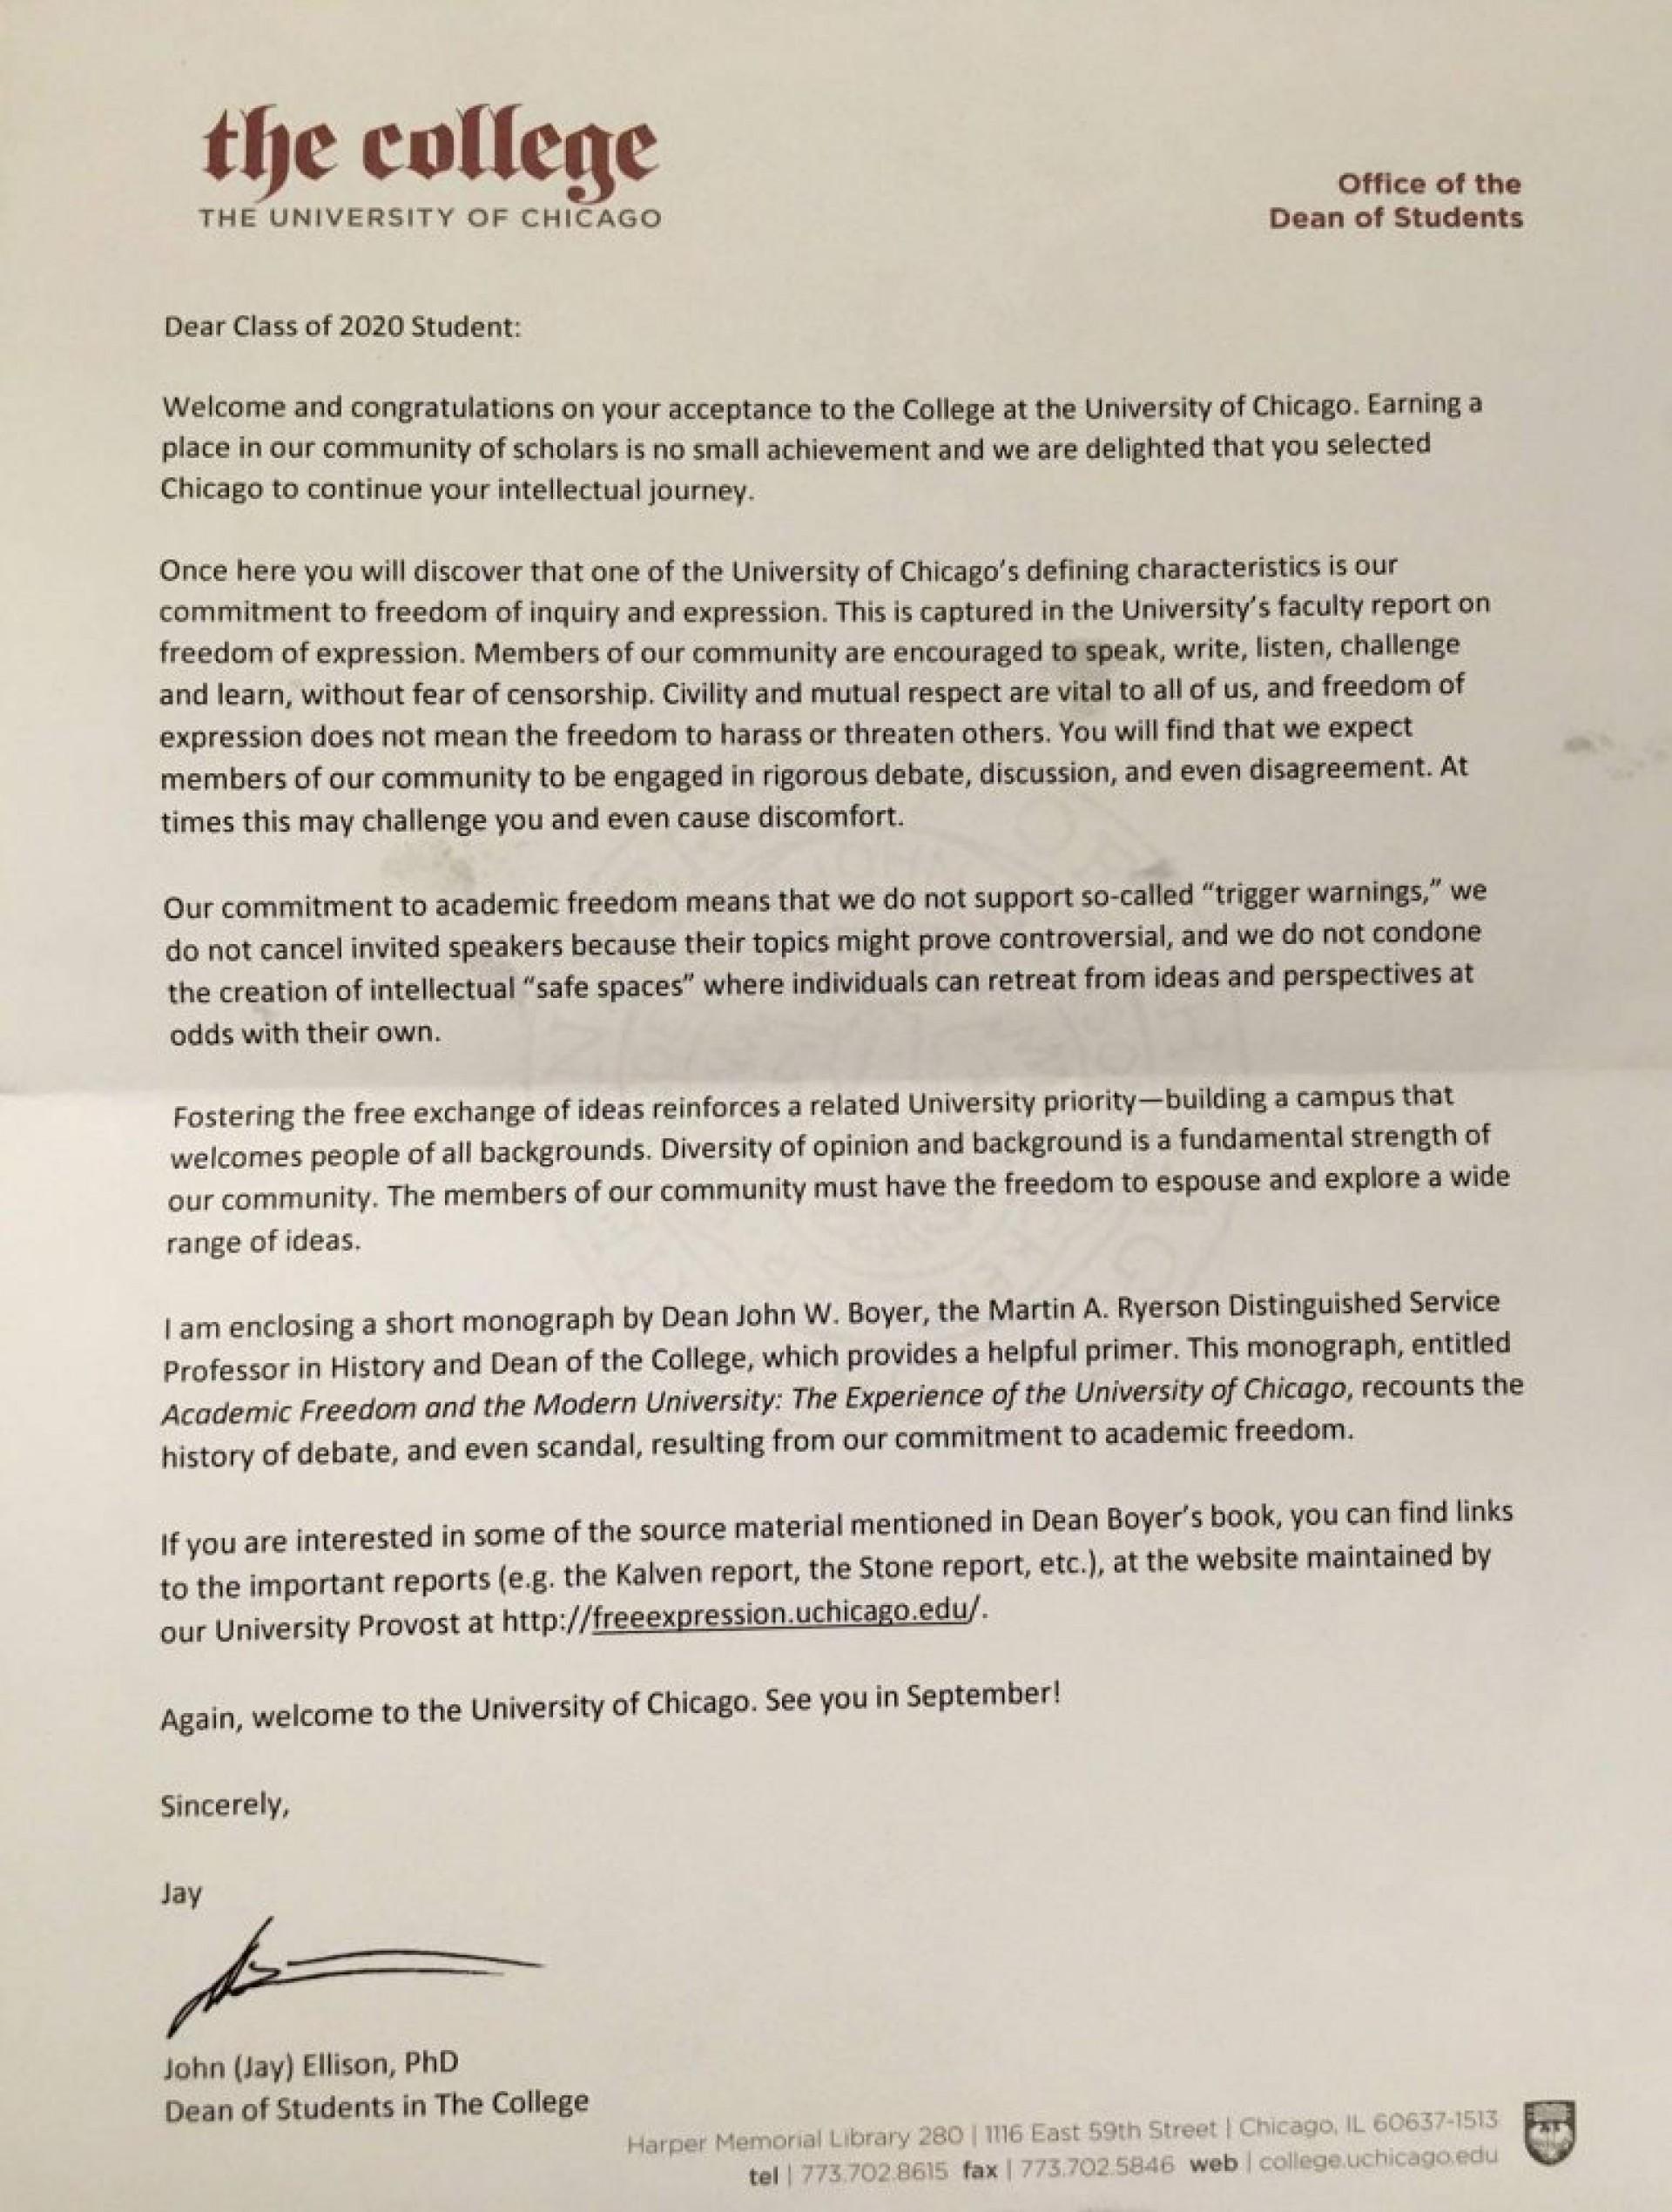 001 Essay Example Uchicago Letter Astounding Essays Law That Worked Length Reddit 1920